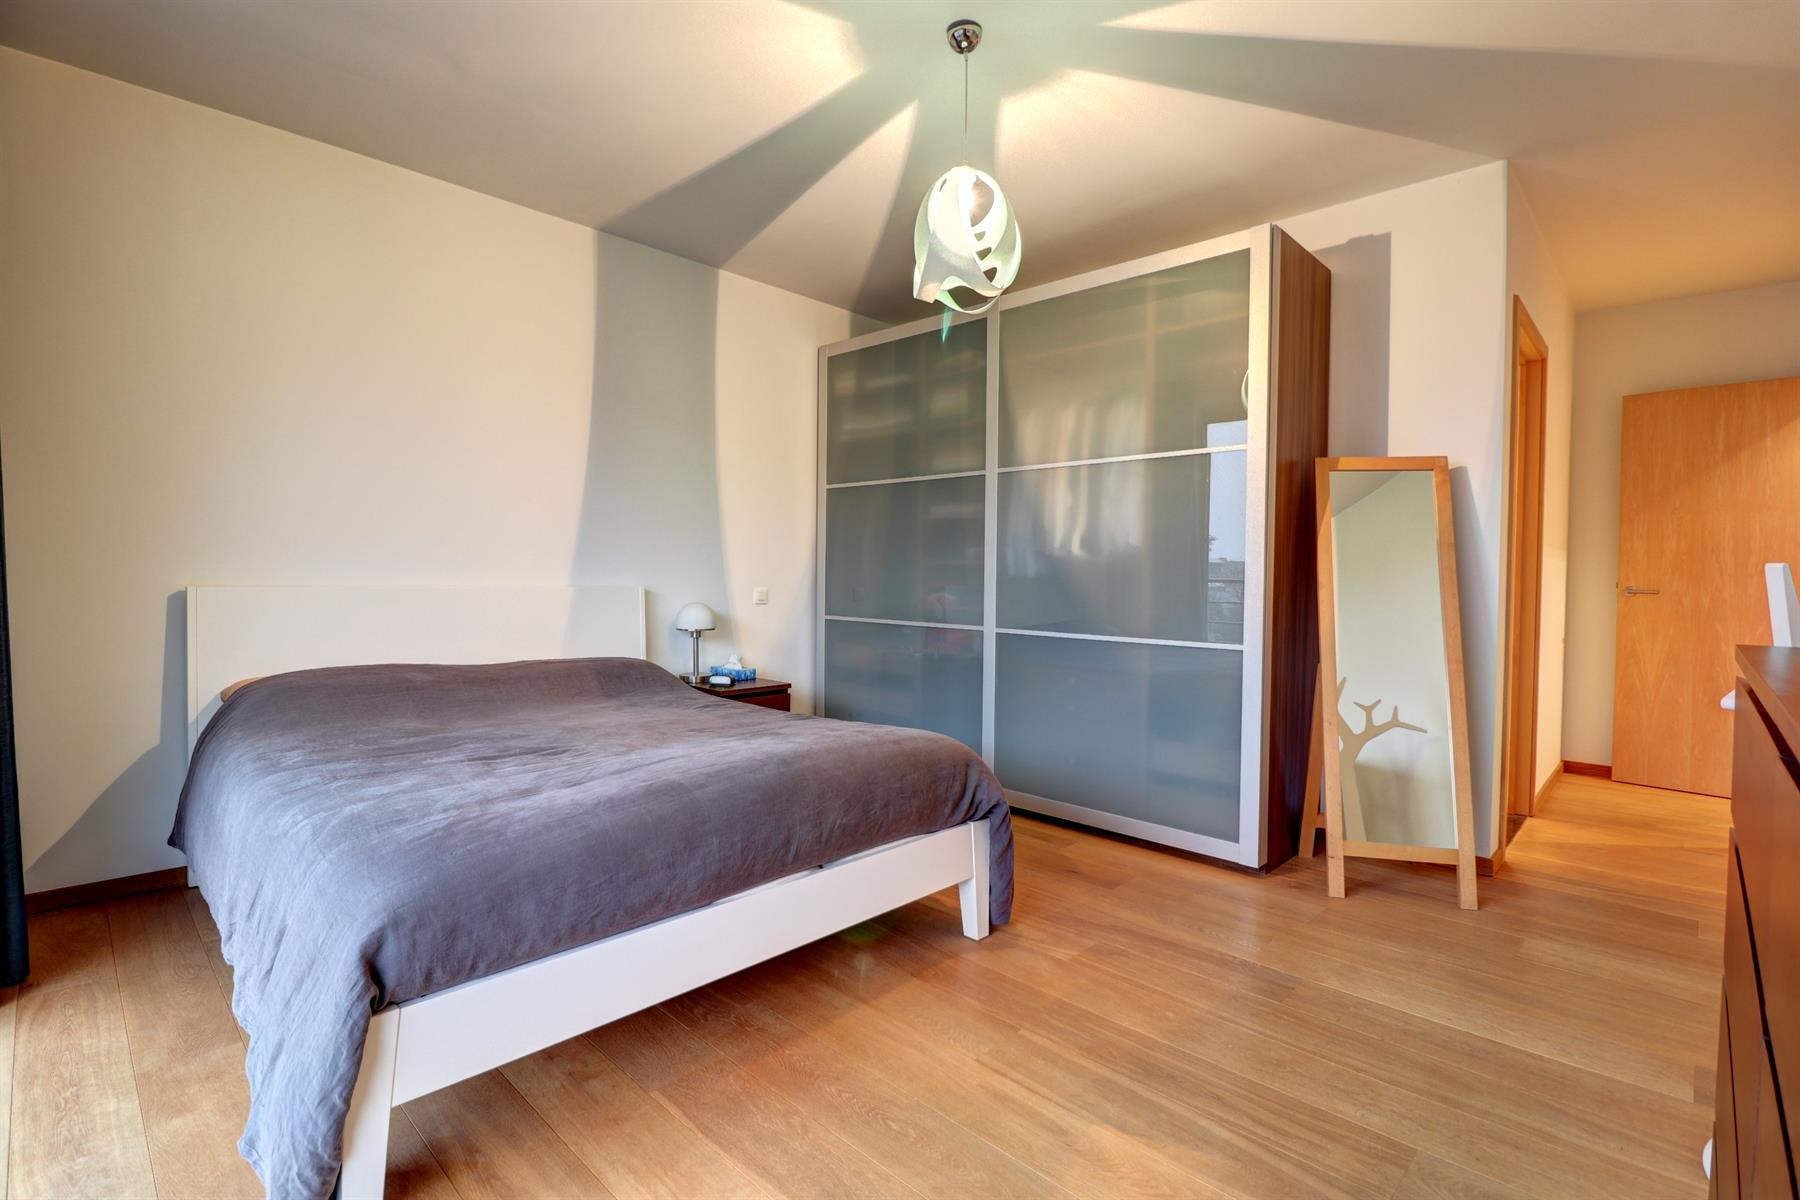 Flat - Saint-Gilles - #4183647-25